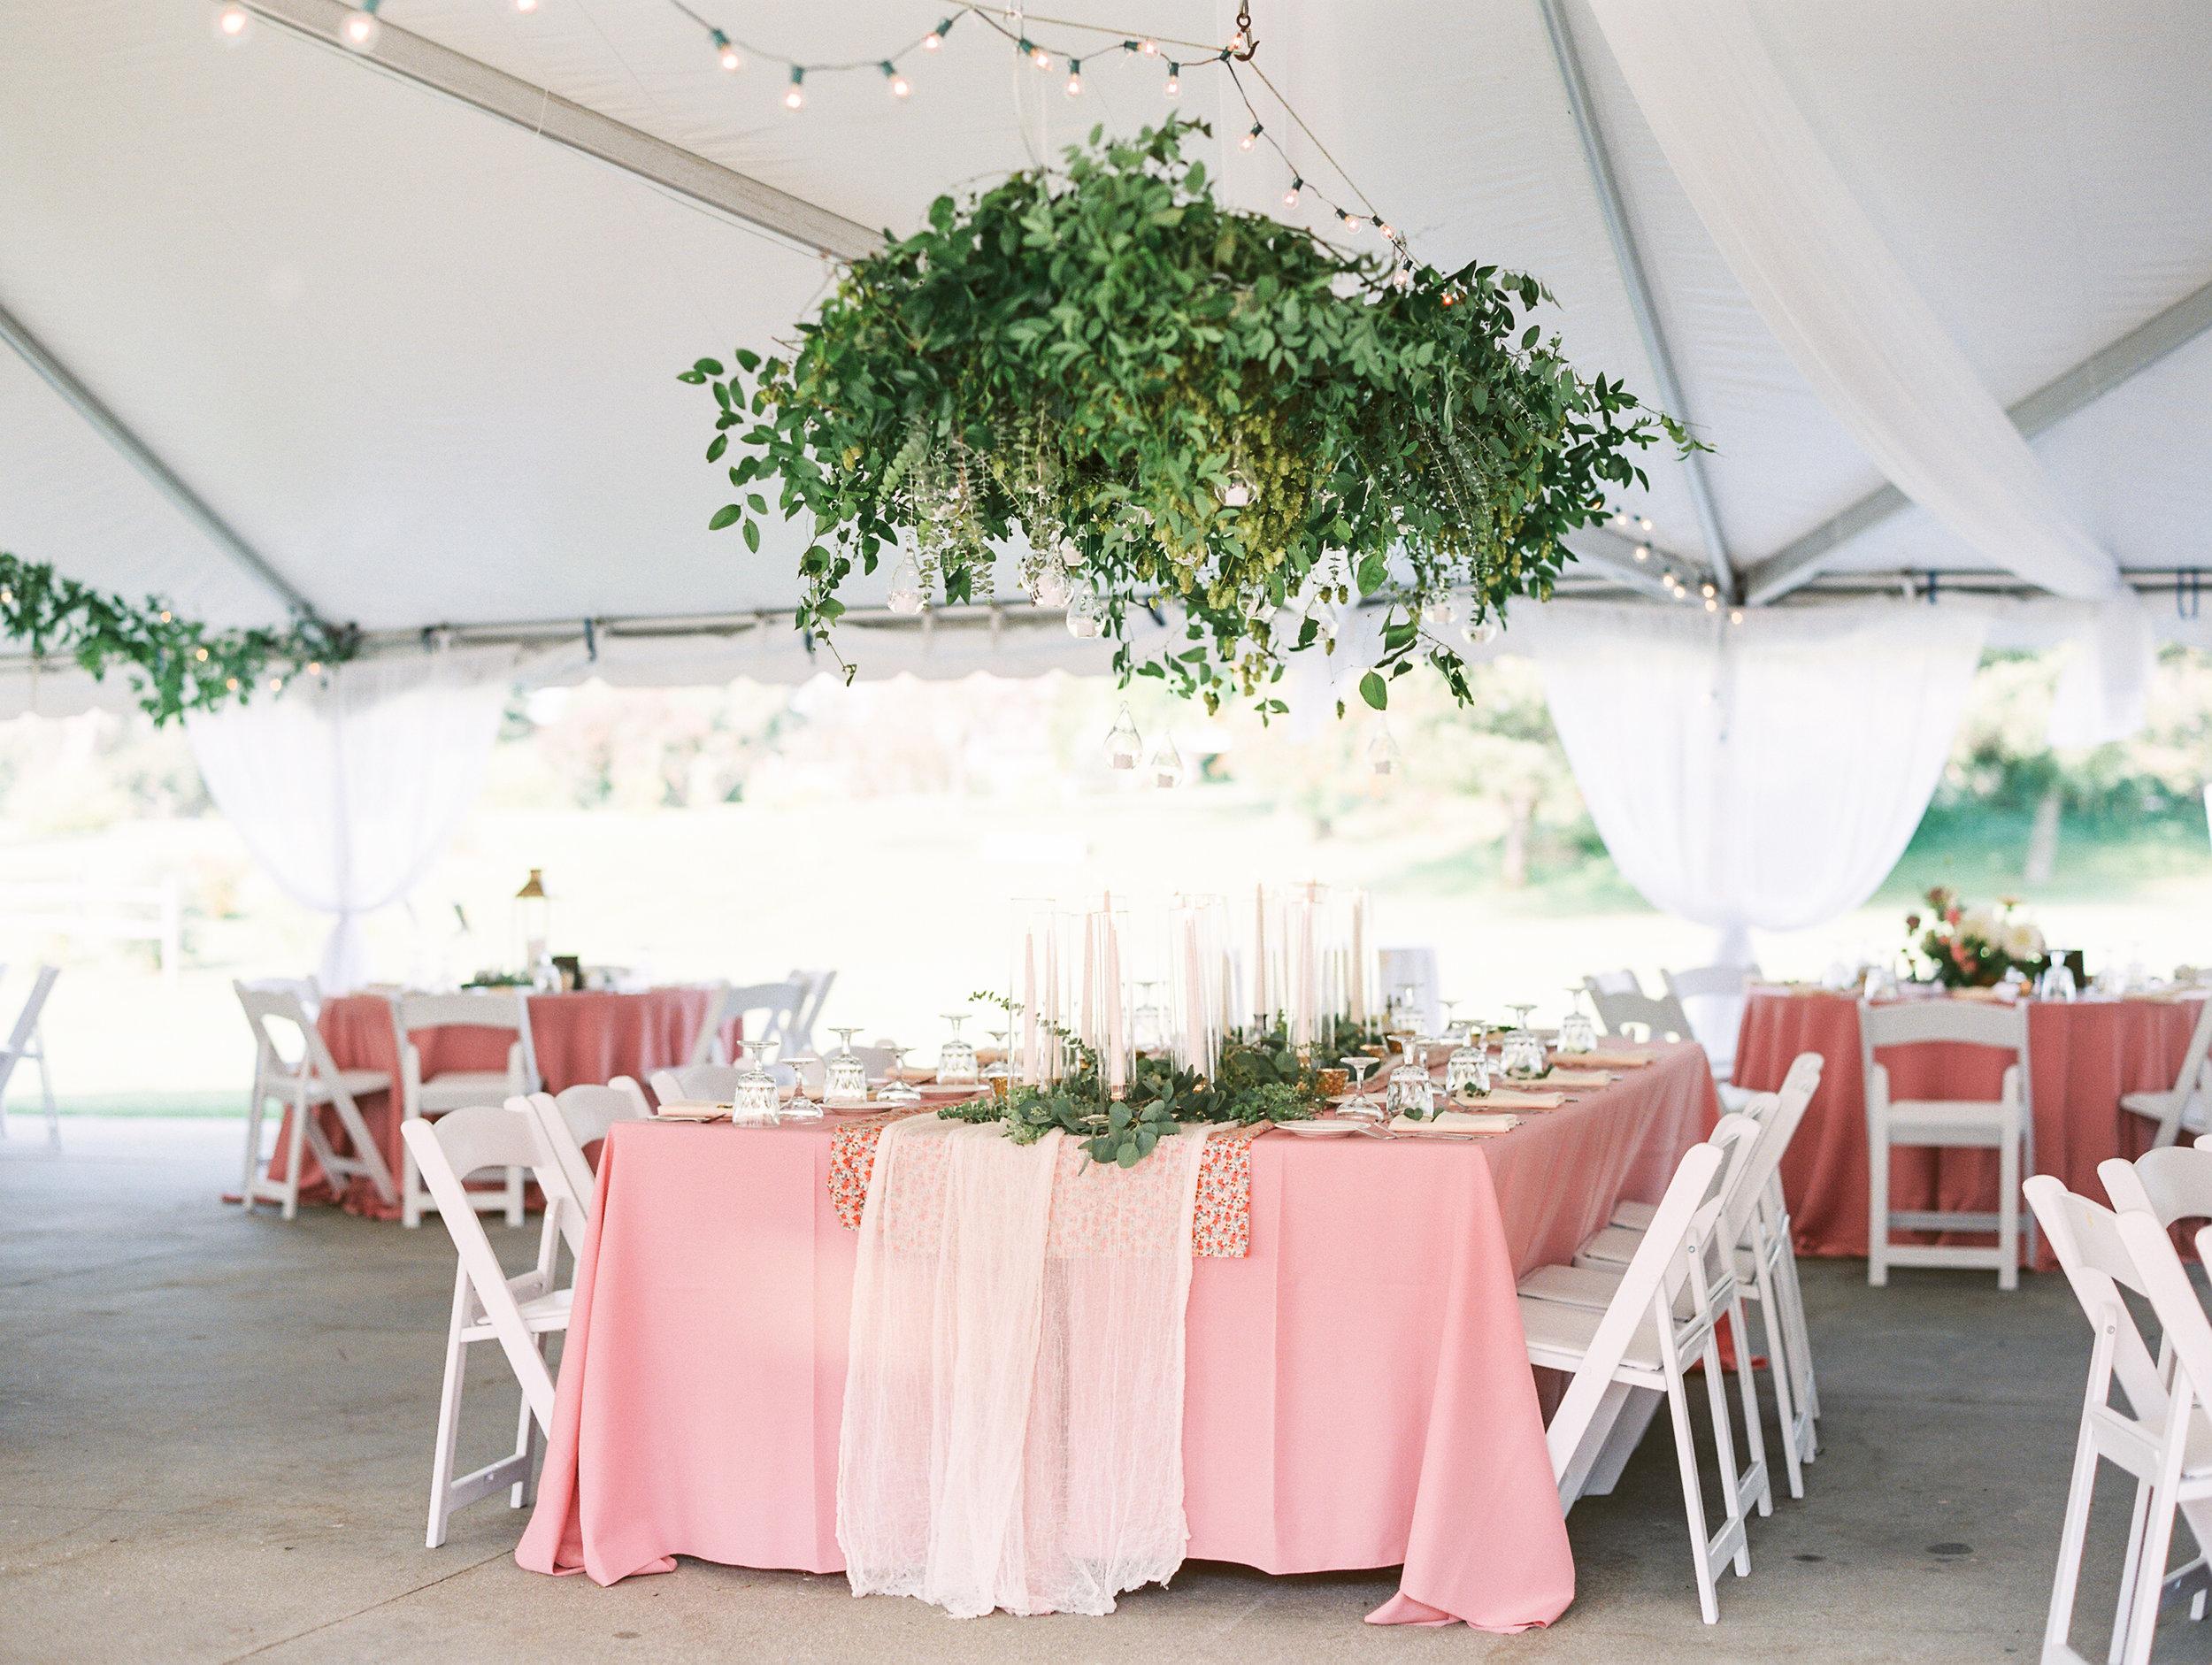 Zoller+Wedding+Reception+Detailsf-25.jpg